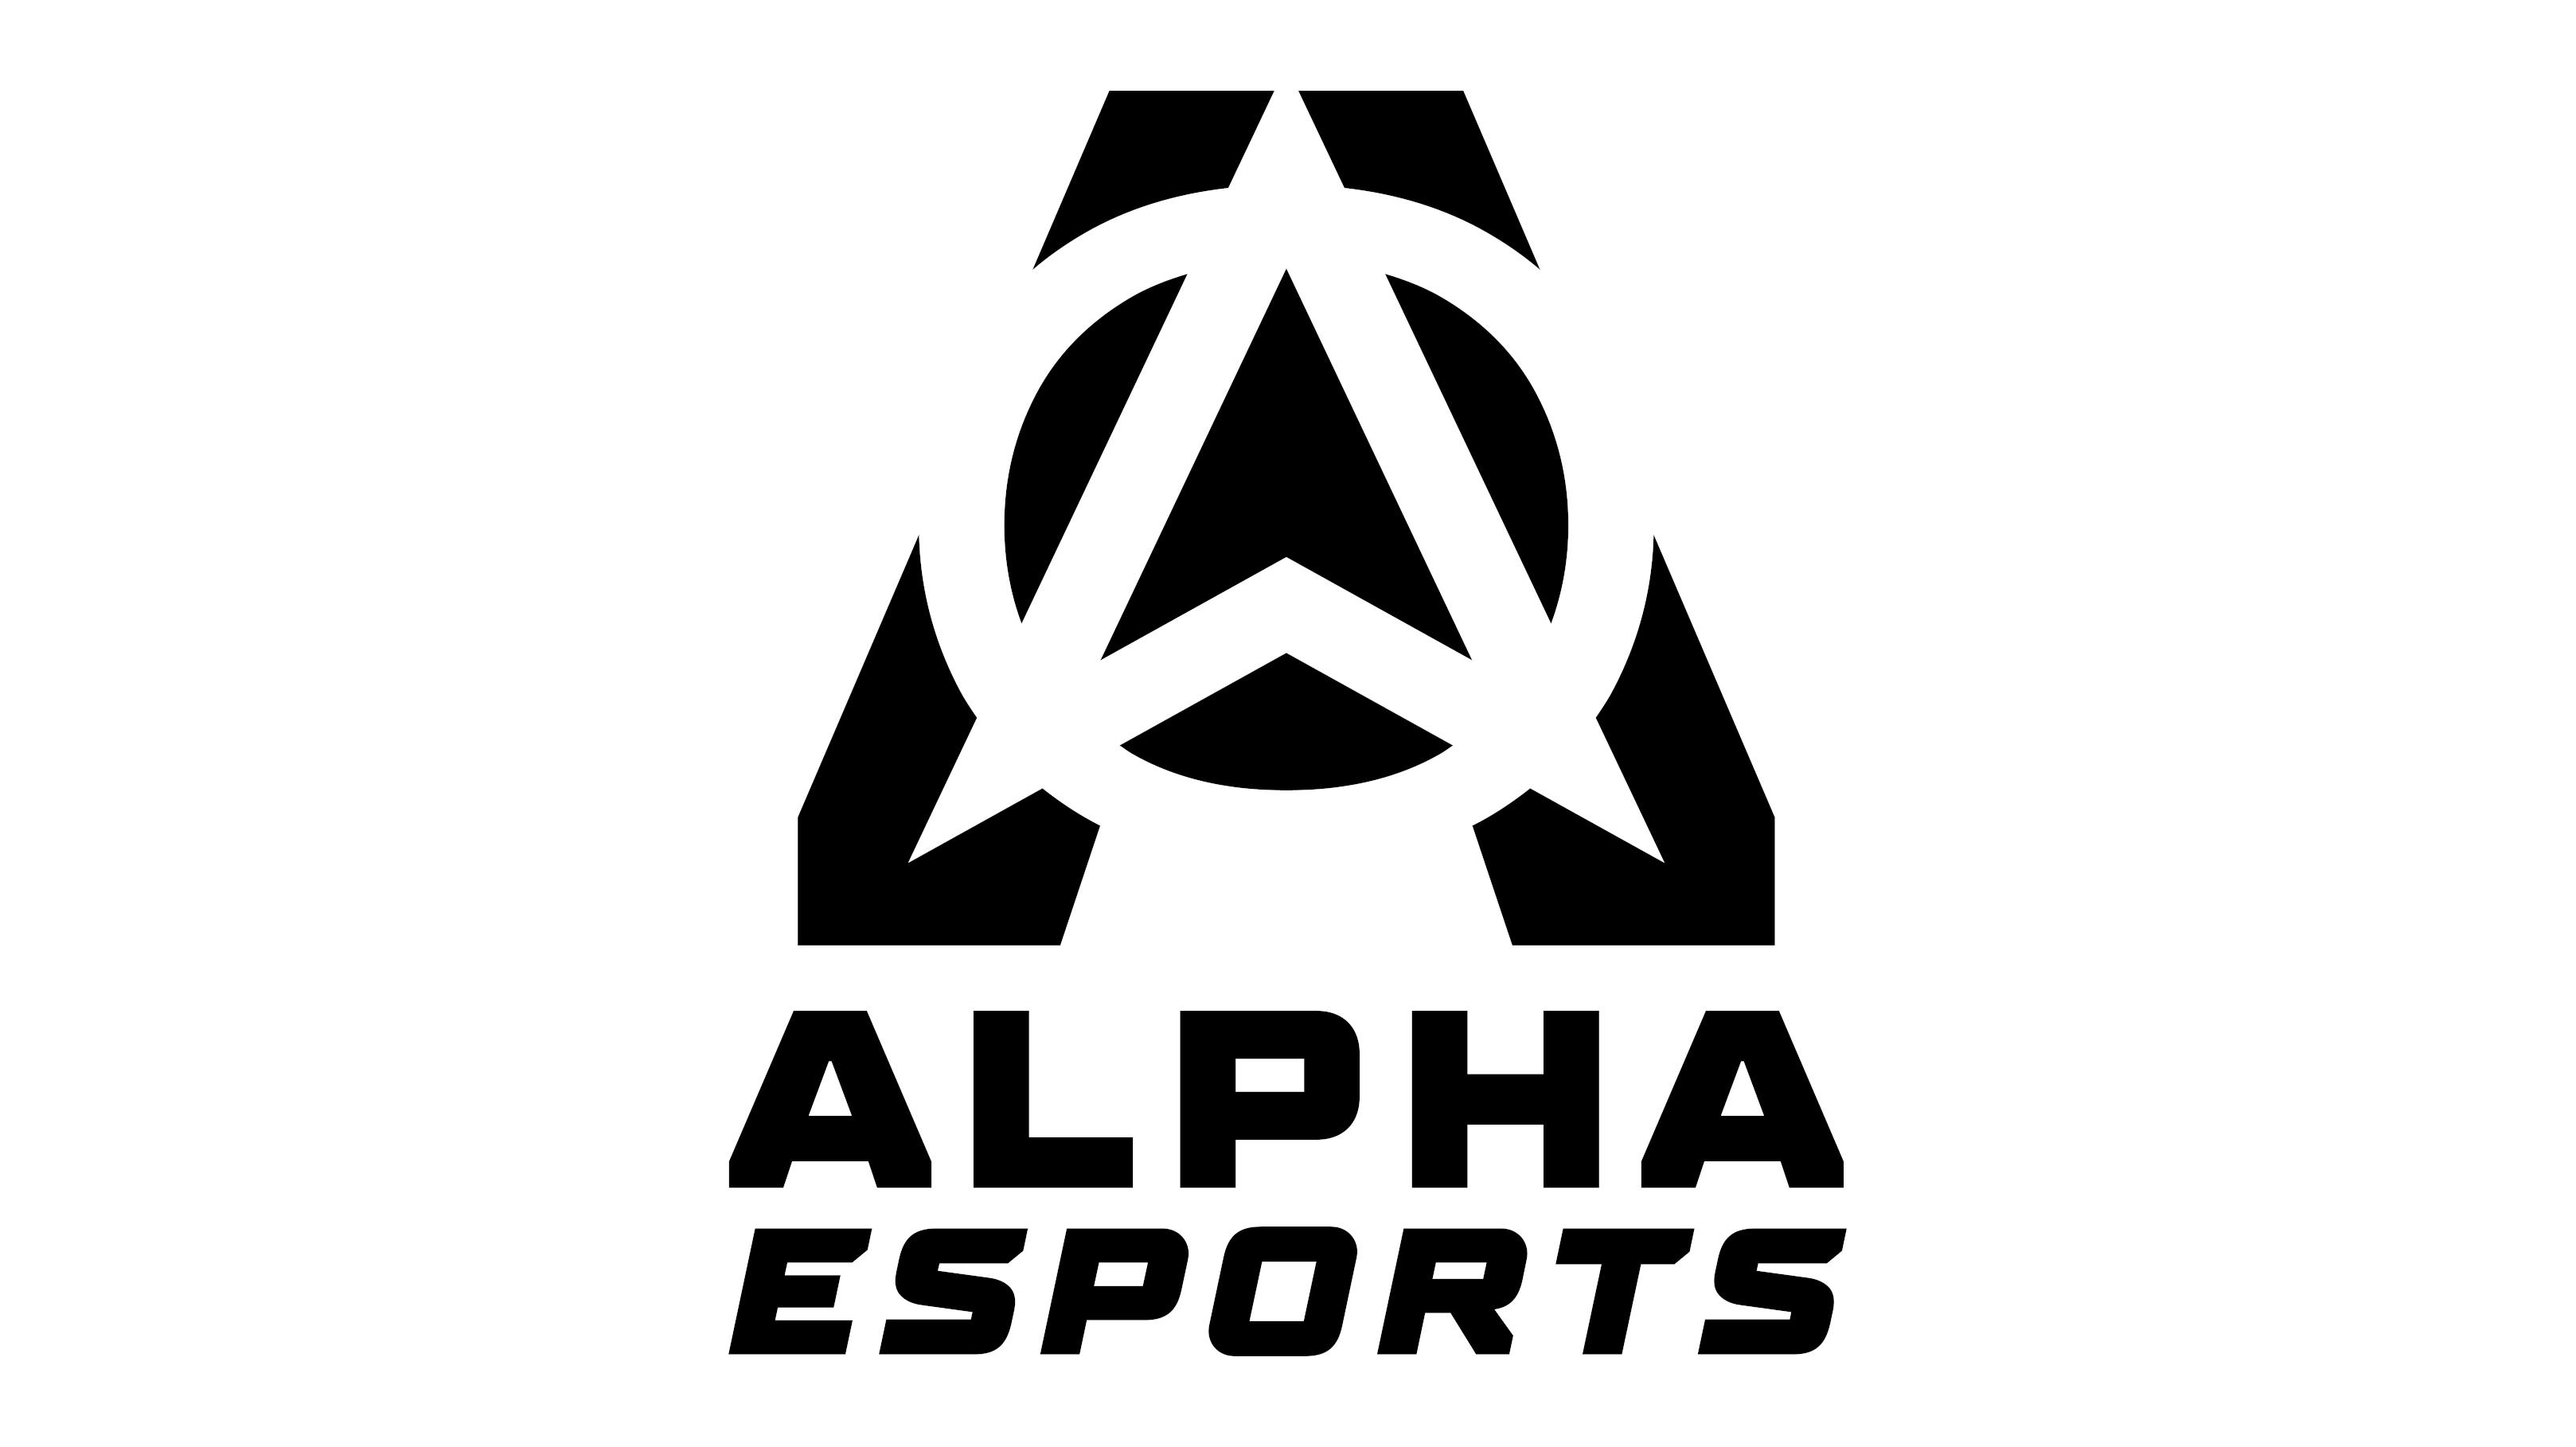 Alpha Esports Announces Launch of Mobile Gaming Platform GamerzArcade